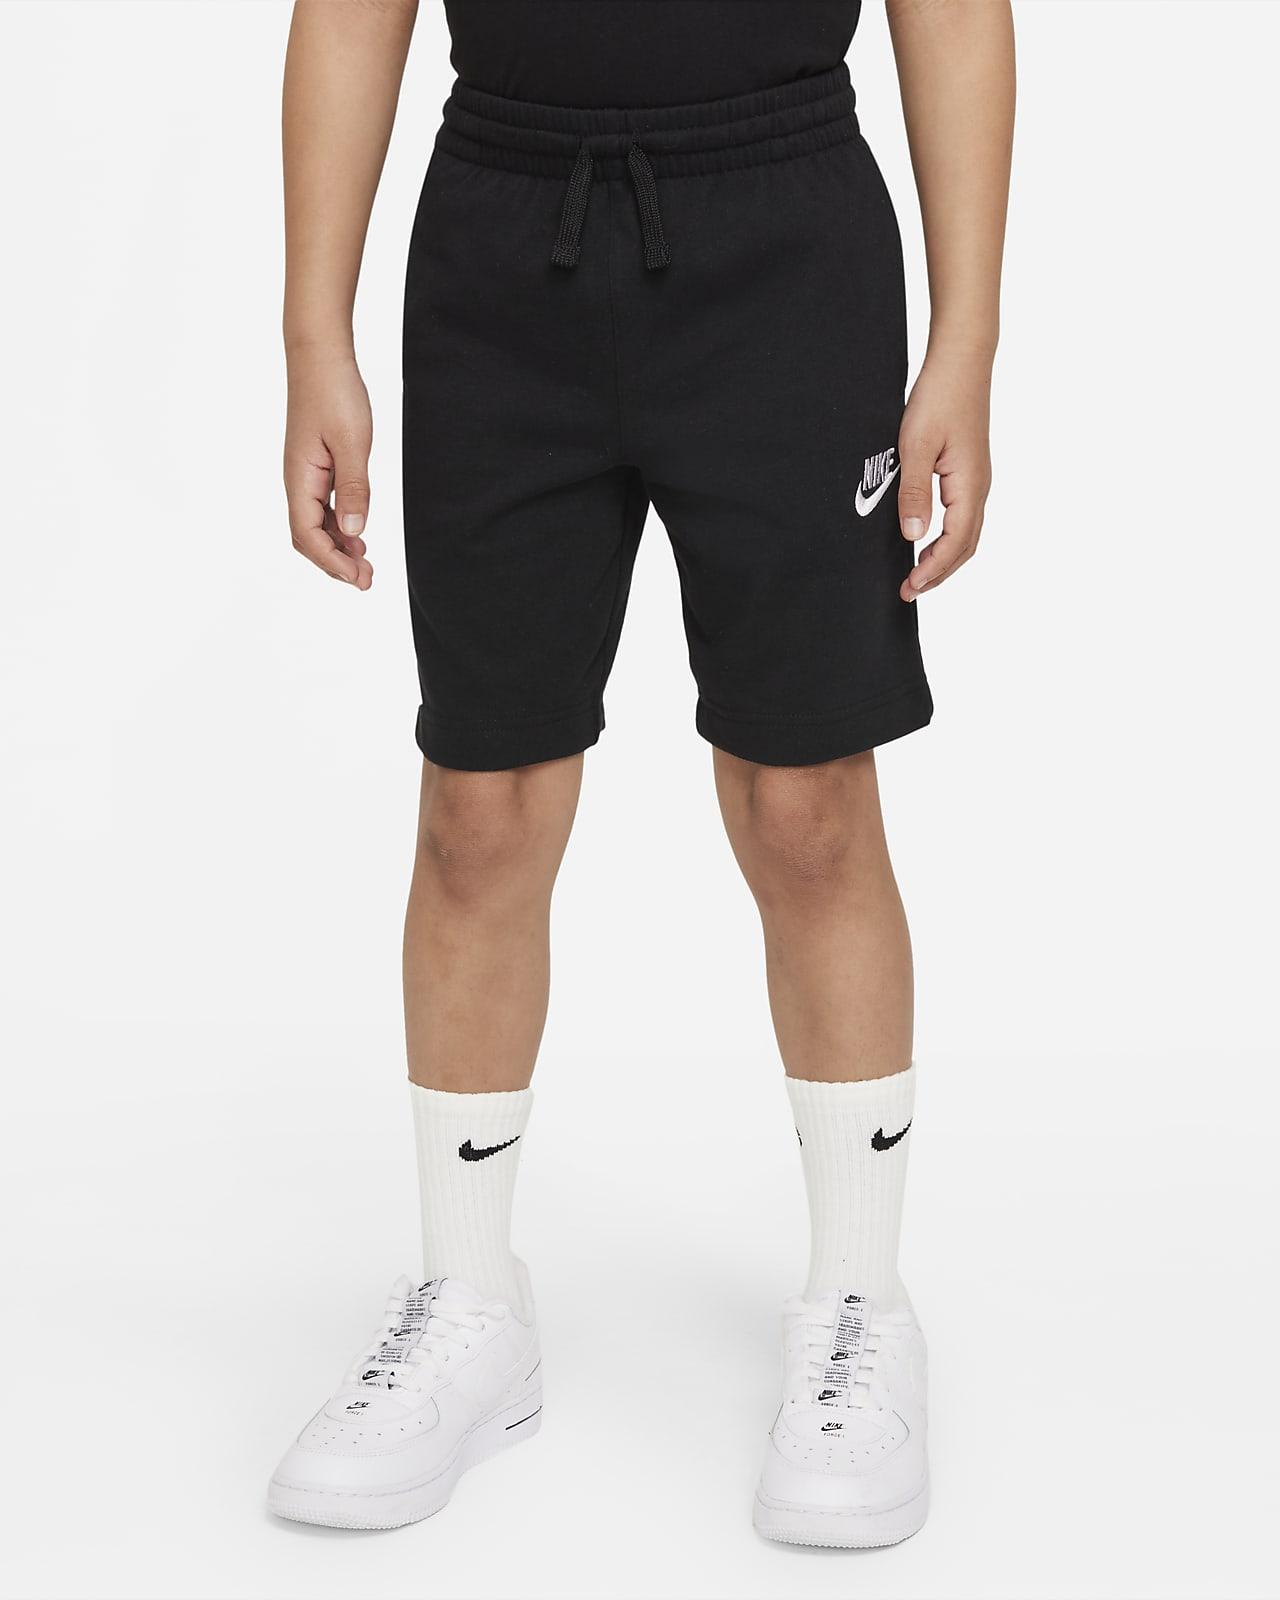 Nike Younger Kids' Shorts